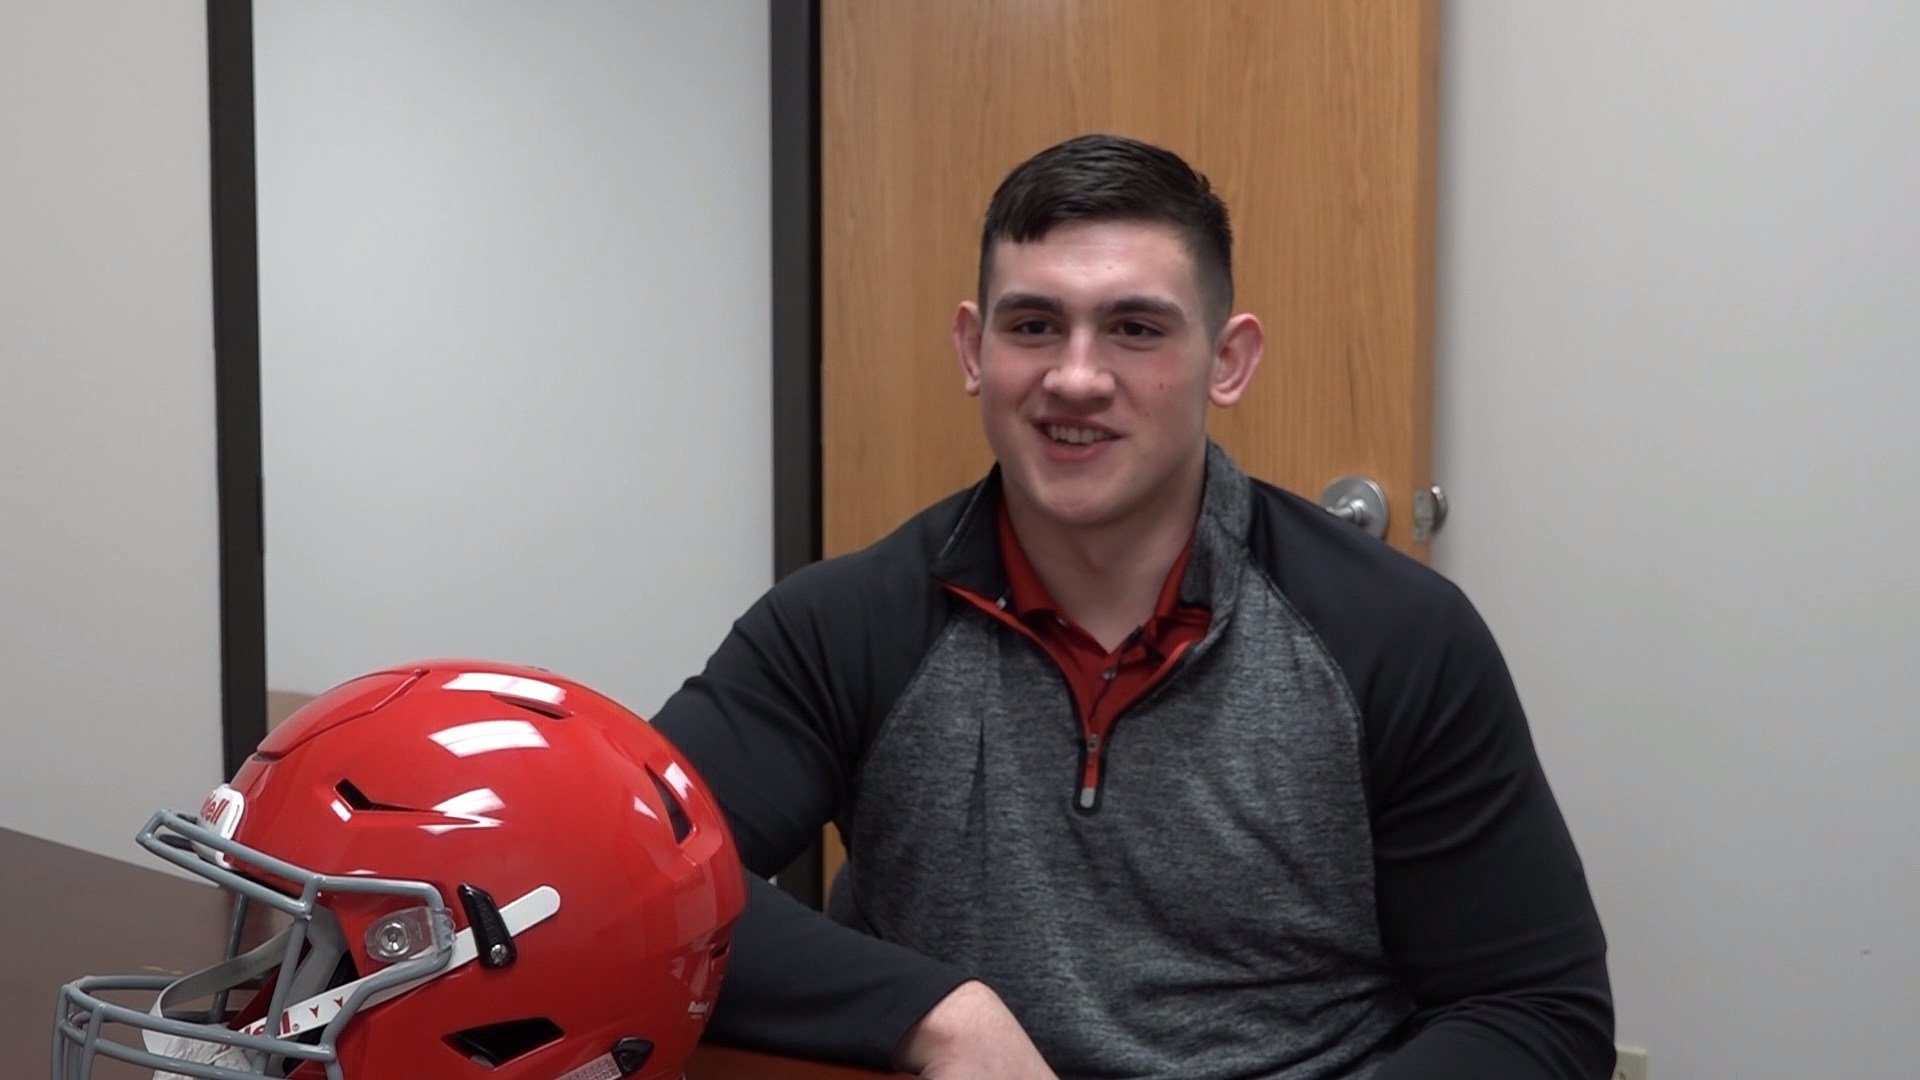 Ethan Piper verbally committed to Nebraska last week.